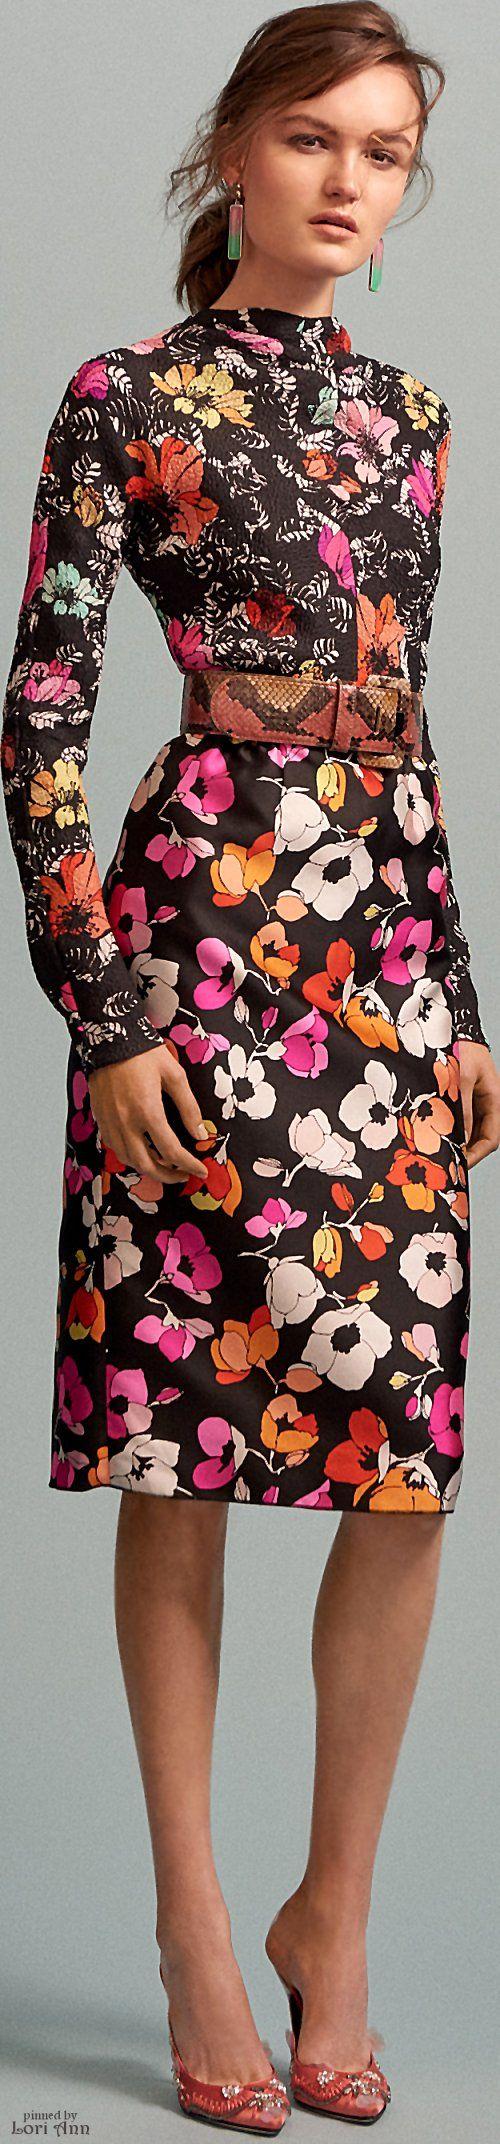 Oscar de la Renta Pre-Fall 2016 floral dress  women fashion outfit clothing style apparel @roressclothes closet ideas